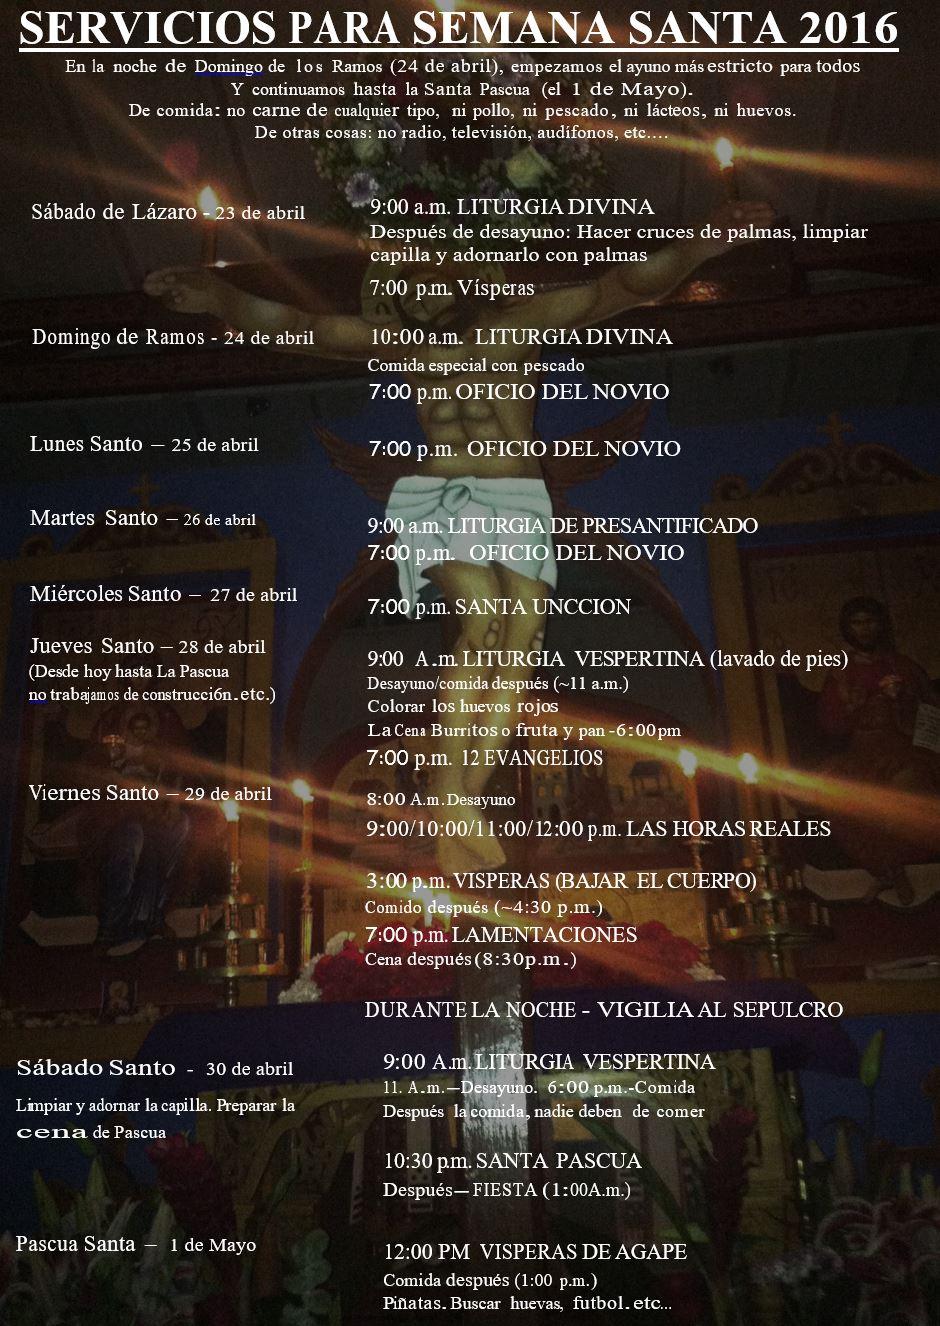 Semana Santa Calendario 2016